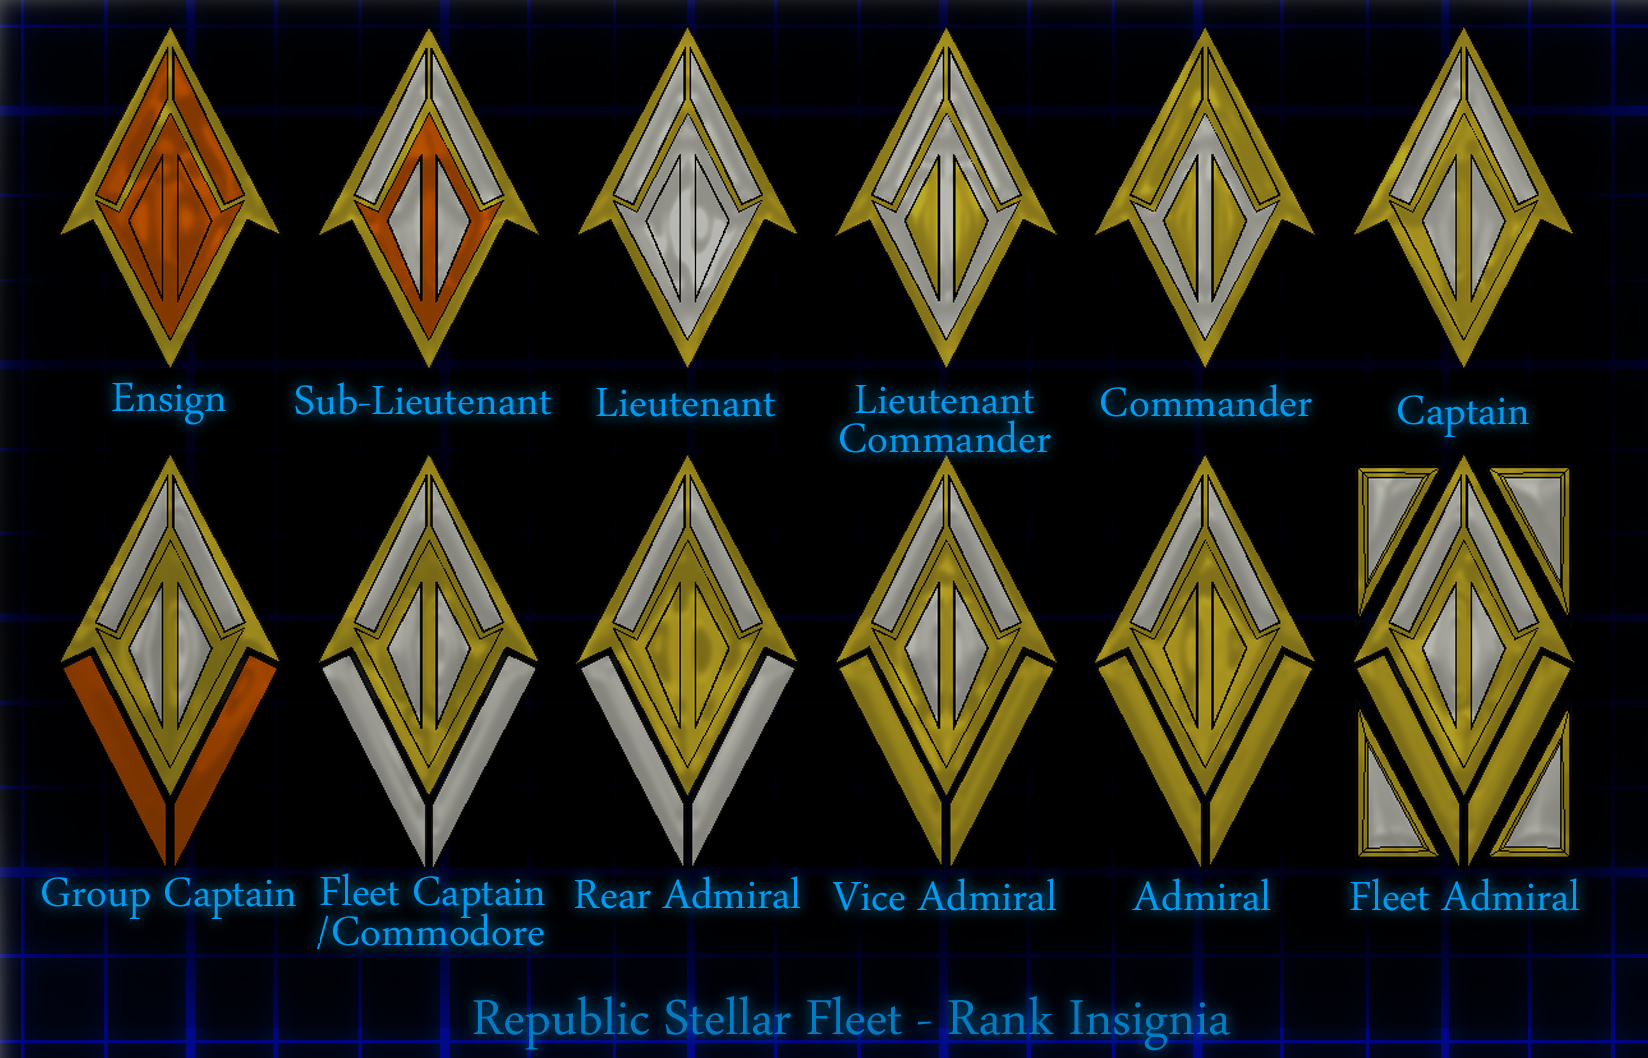 Battlestar Galactica Ranks